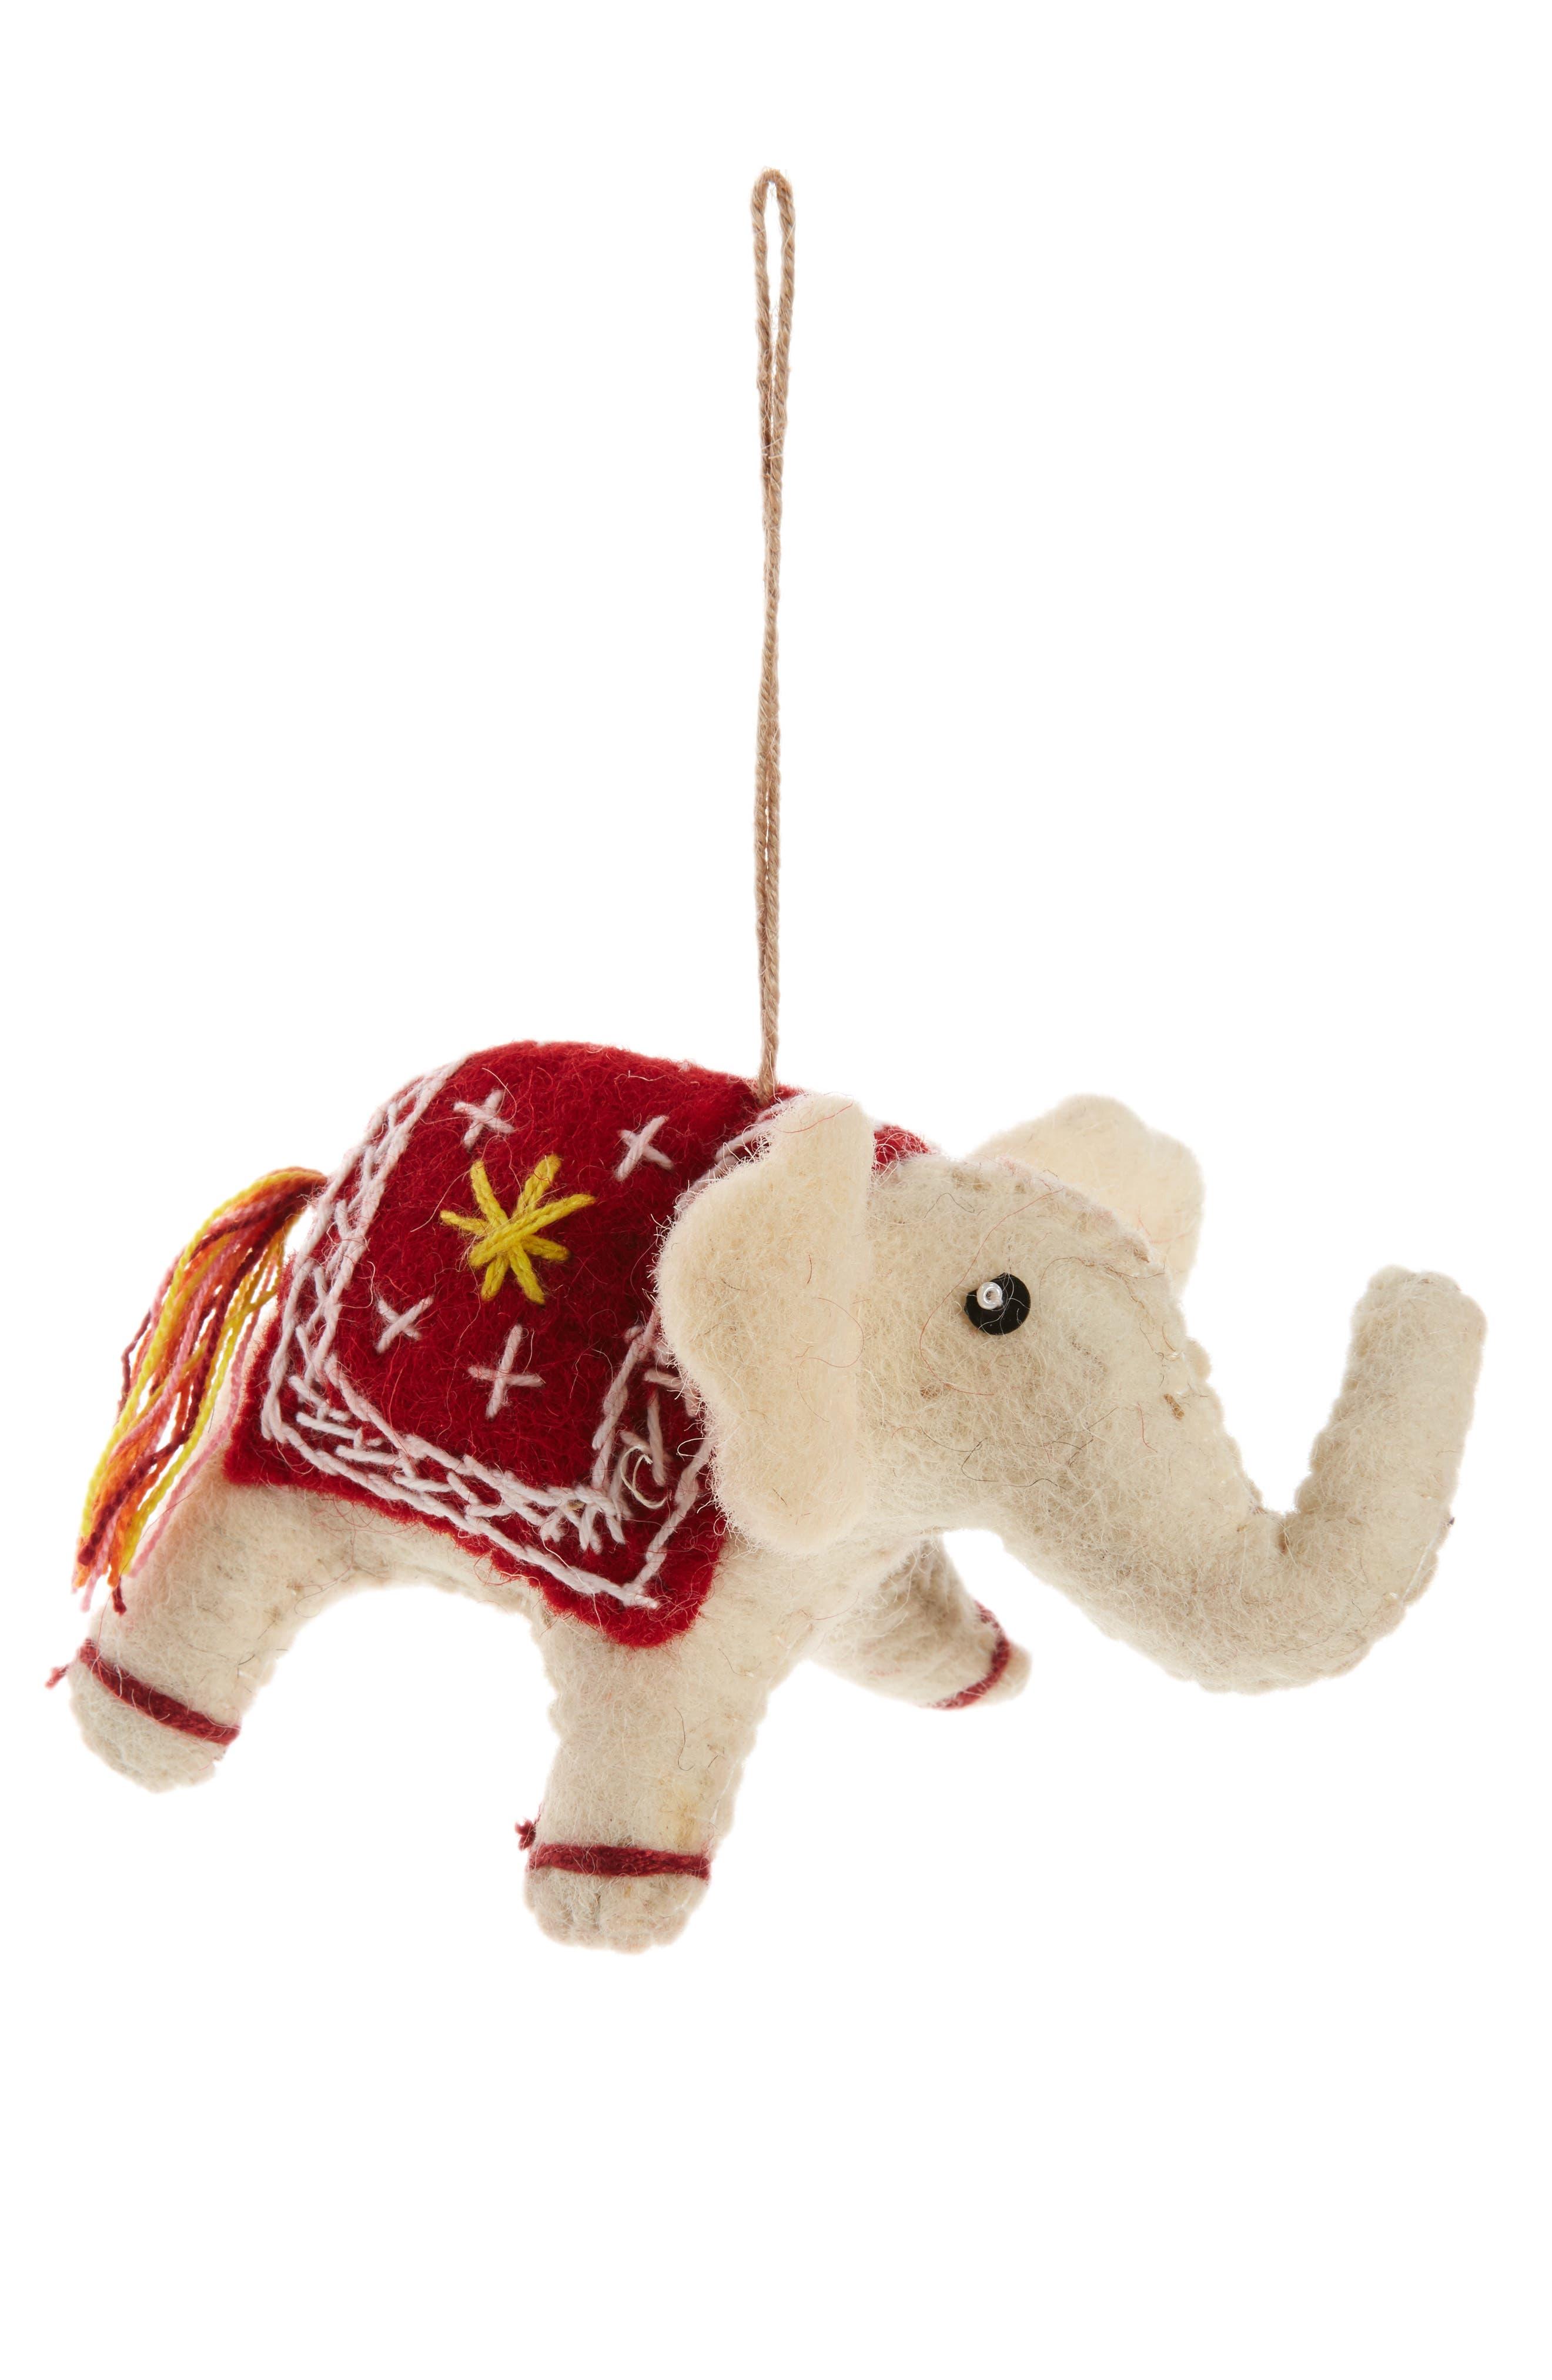 Nordstrom at Home Elephant Felt Ornament